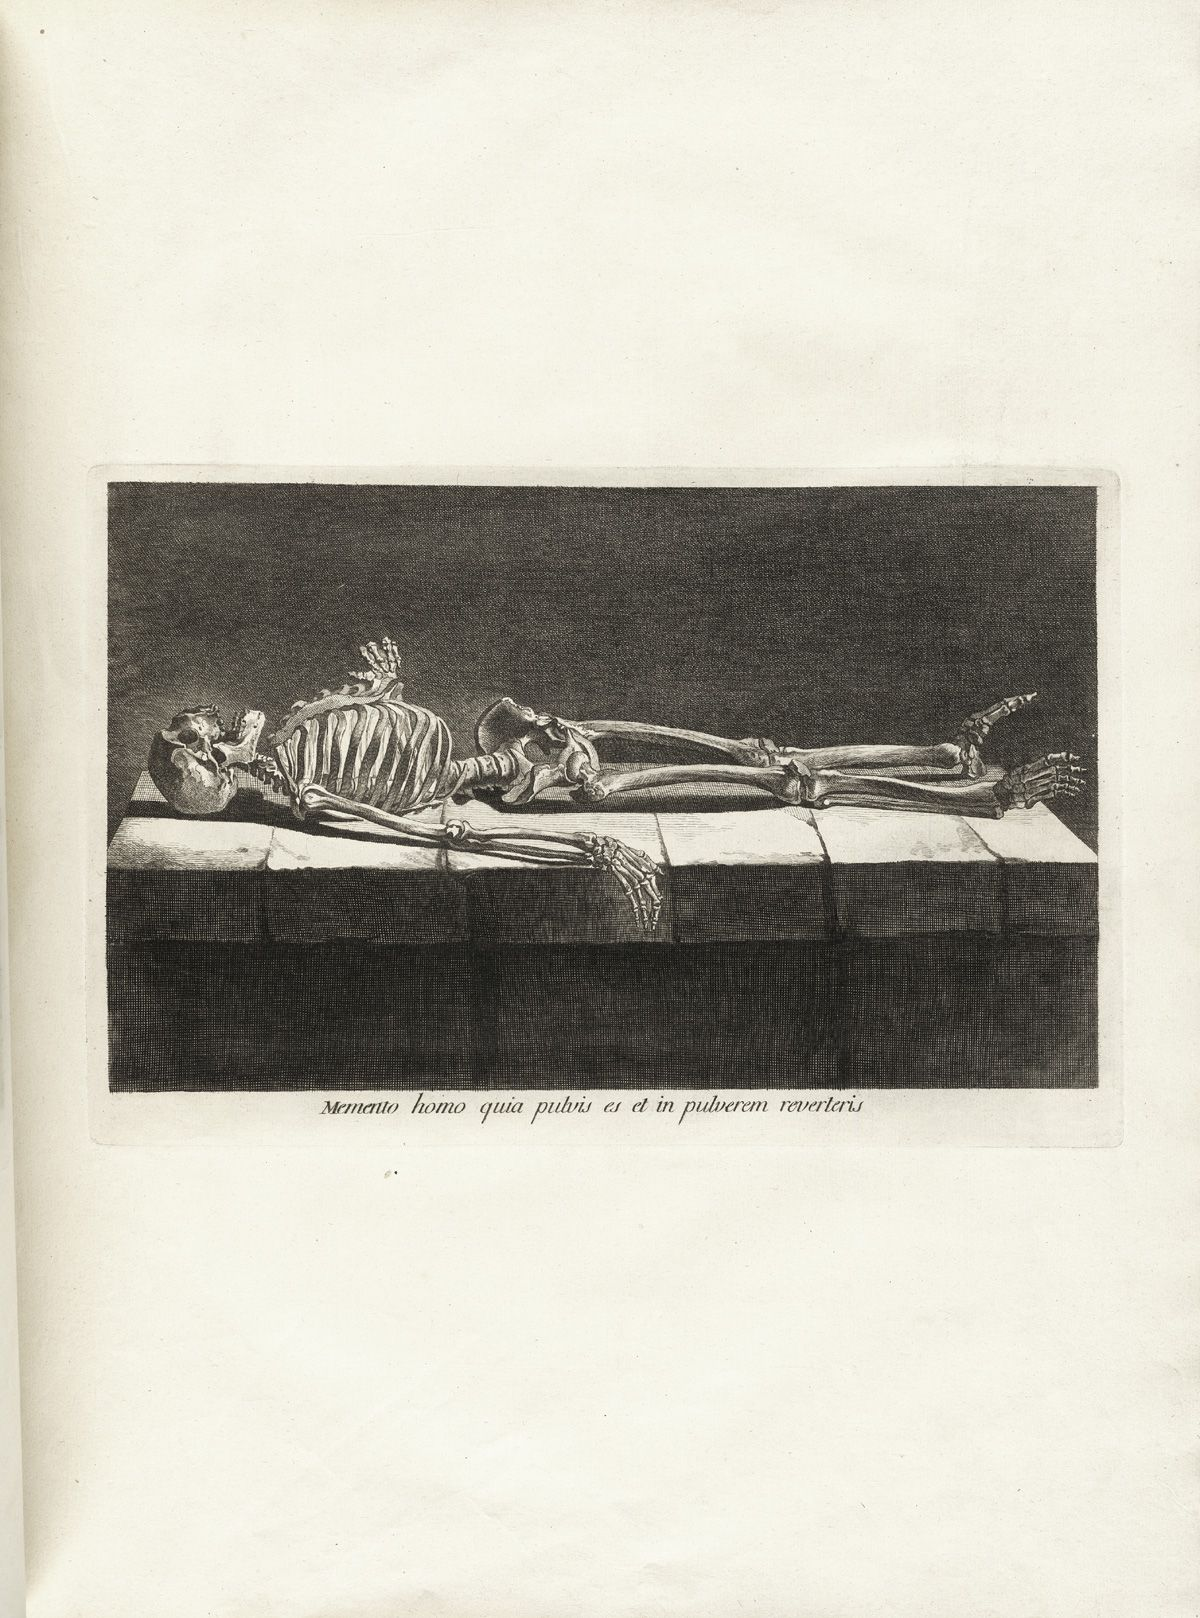 Human Skeleton Lying Down Tenderness Co